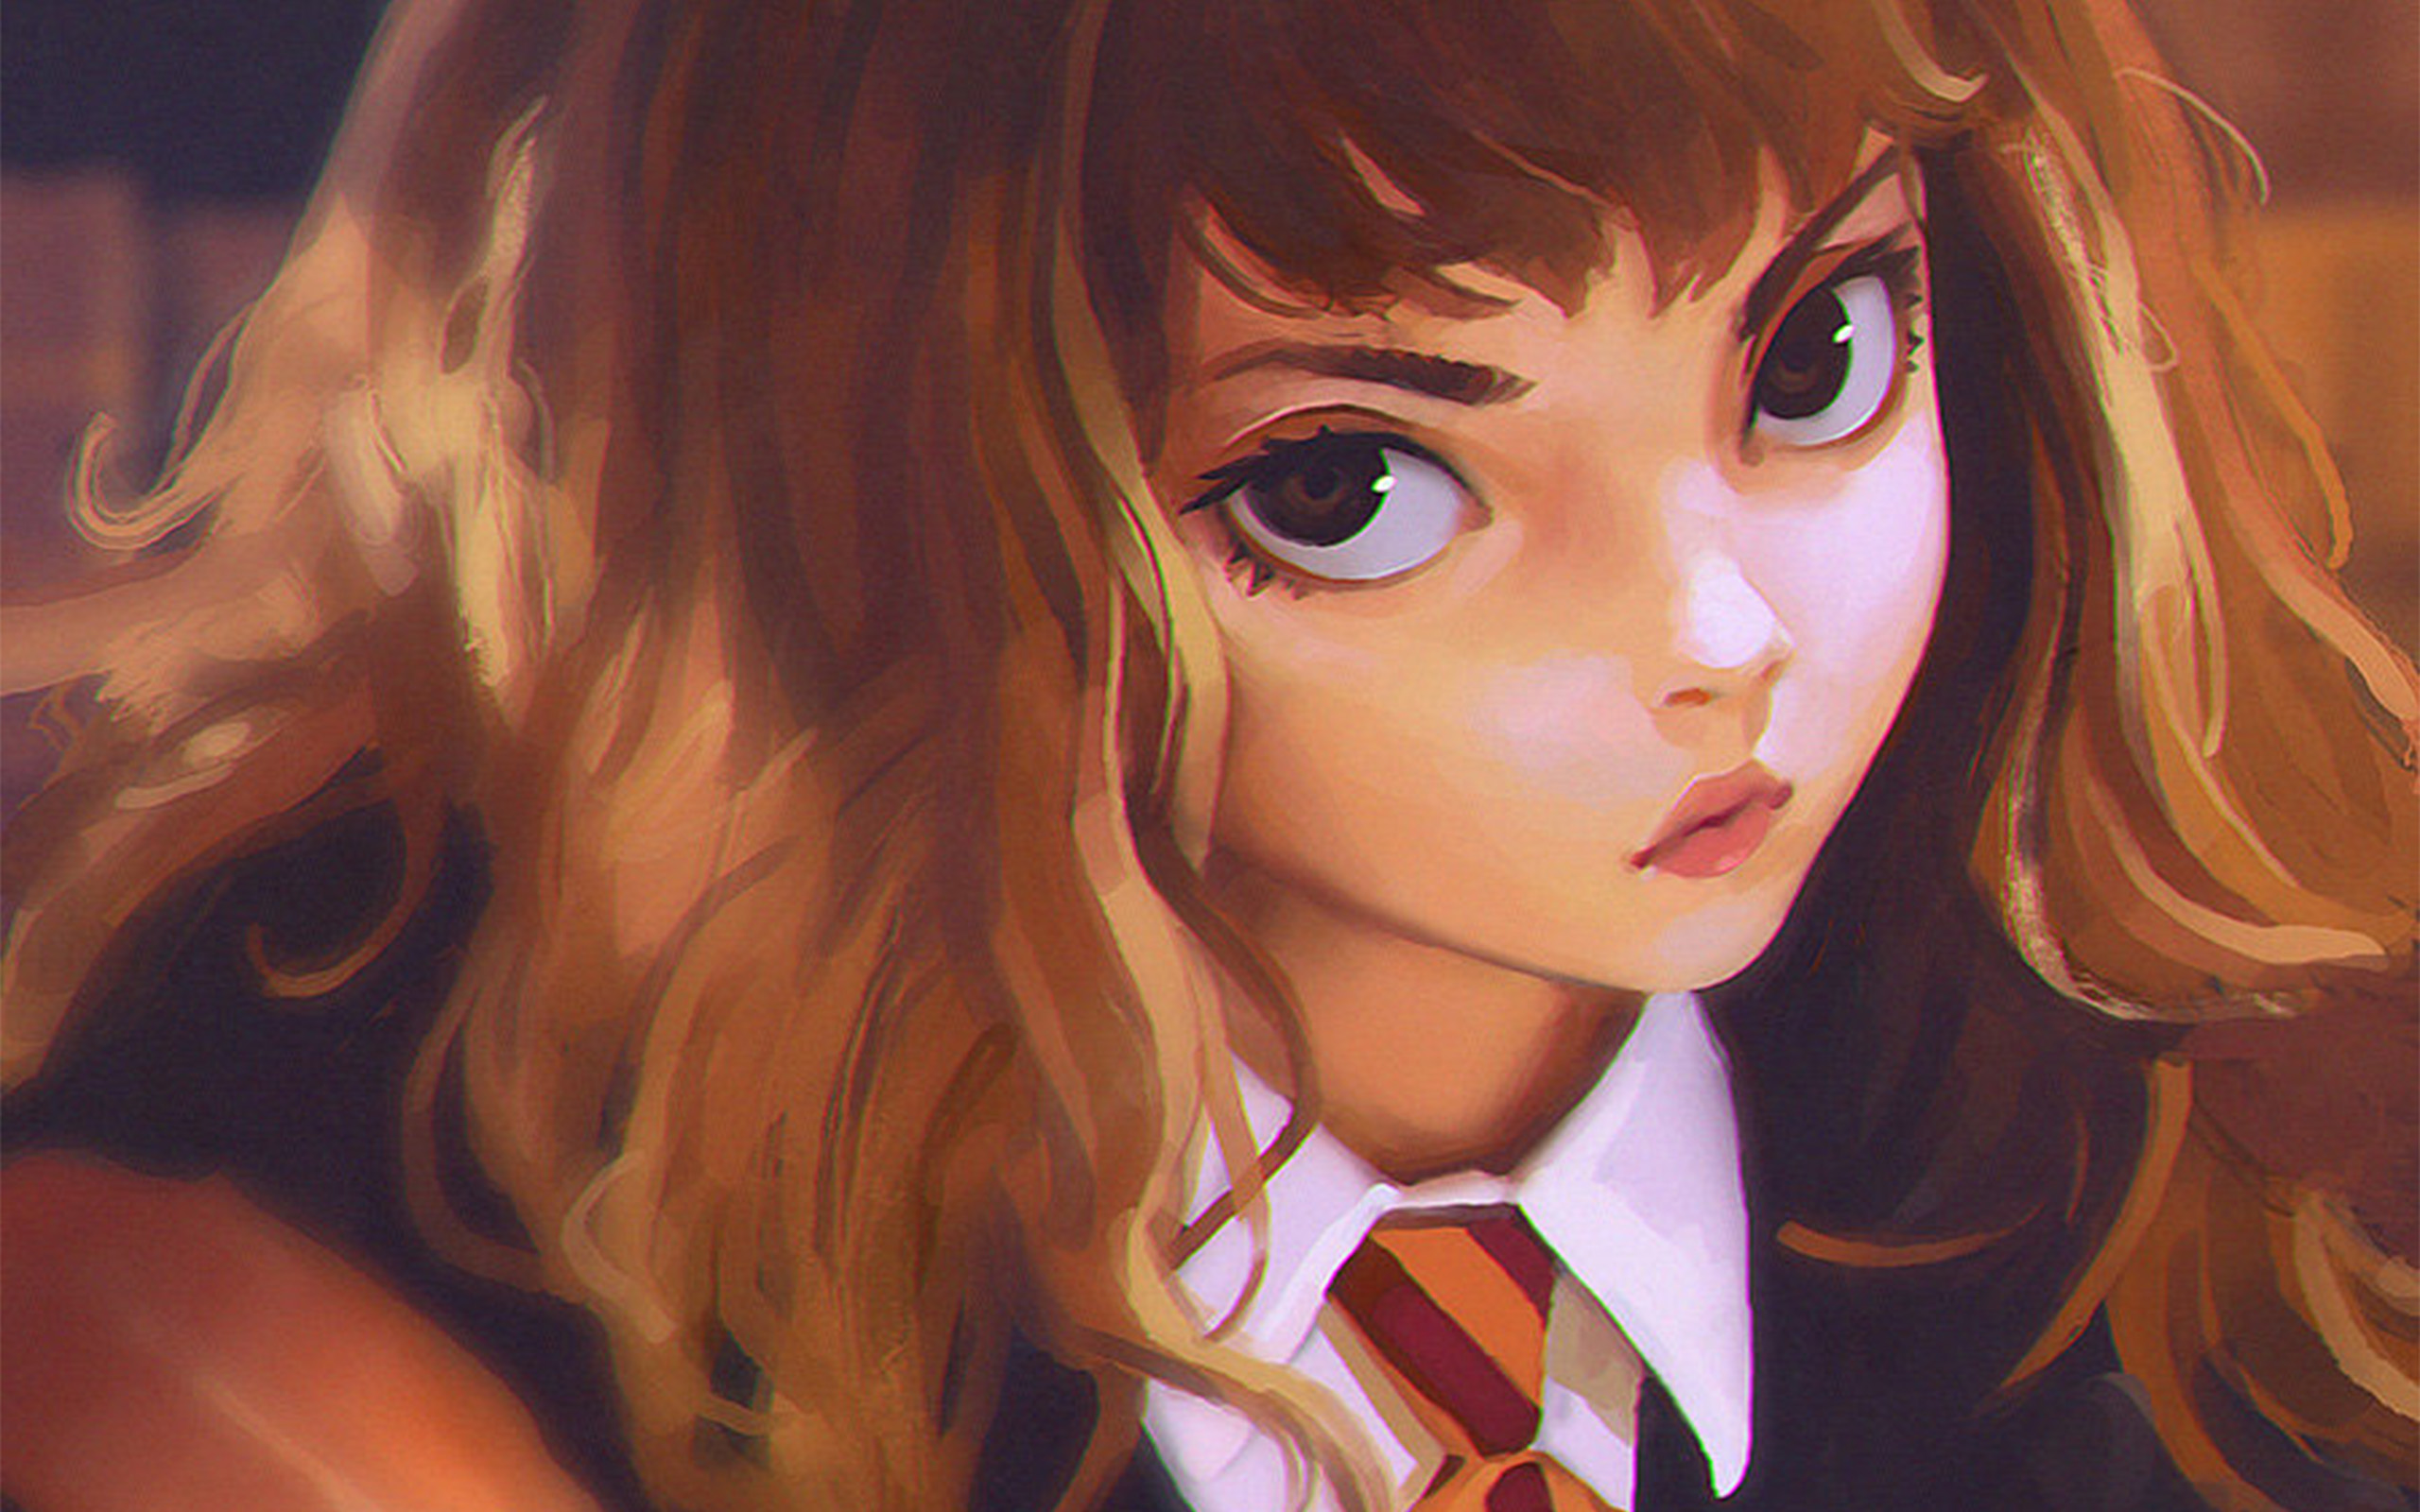 Simple Girl Wallpaper Pc Bd65 Hermione Harry Potter Liya Art Illustration Wallpaper